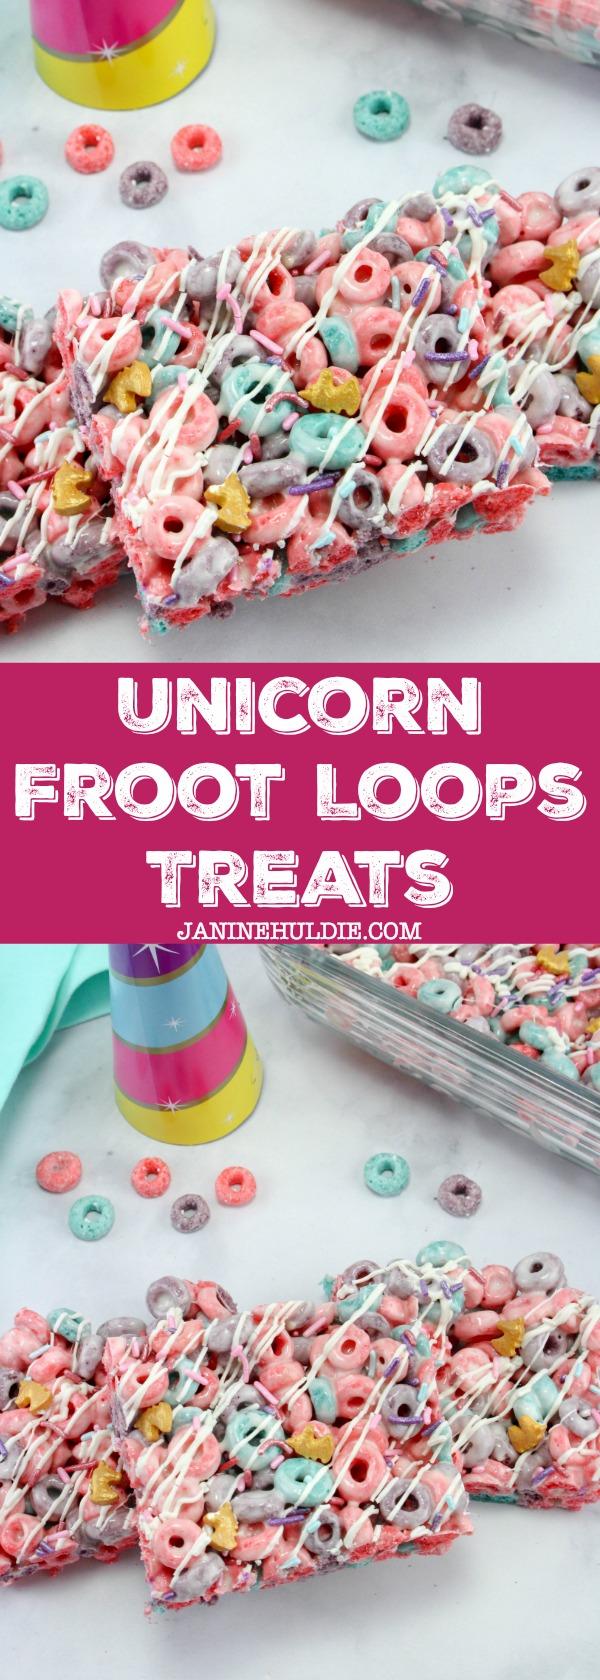 Unicorn Froot Loops Treats Recipe